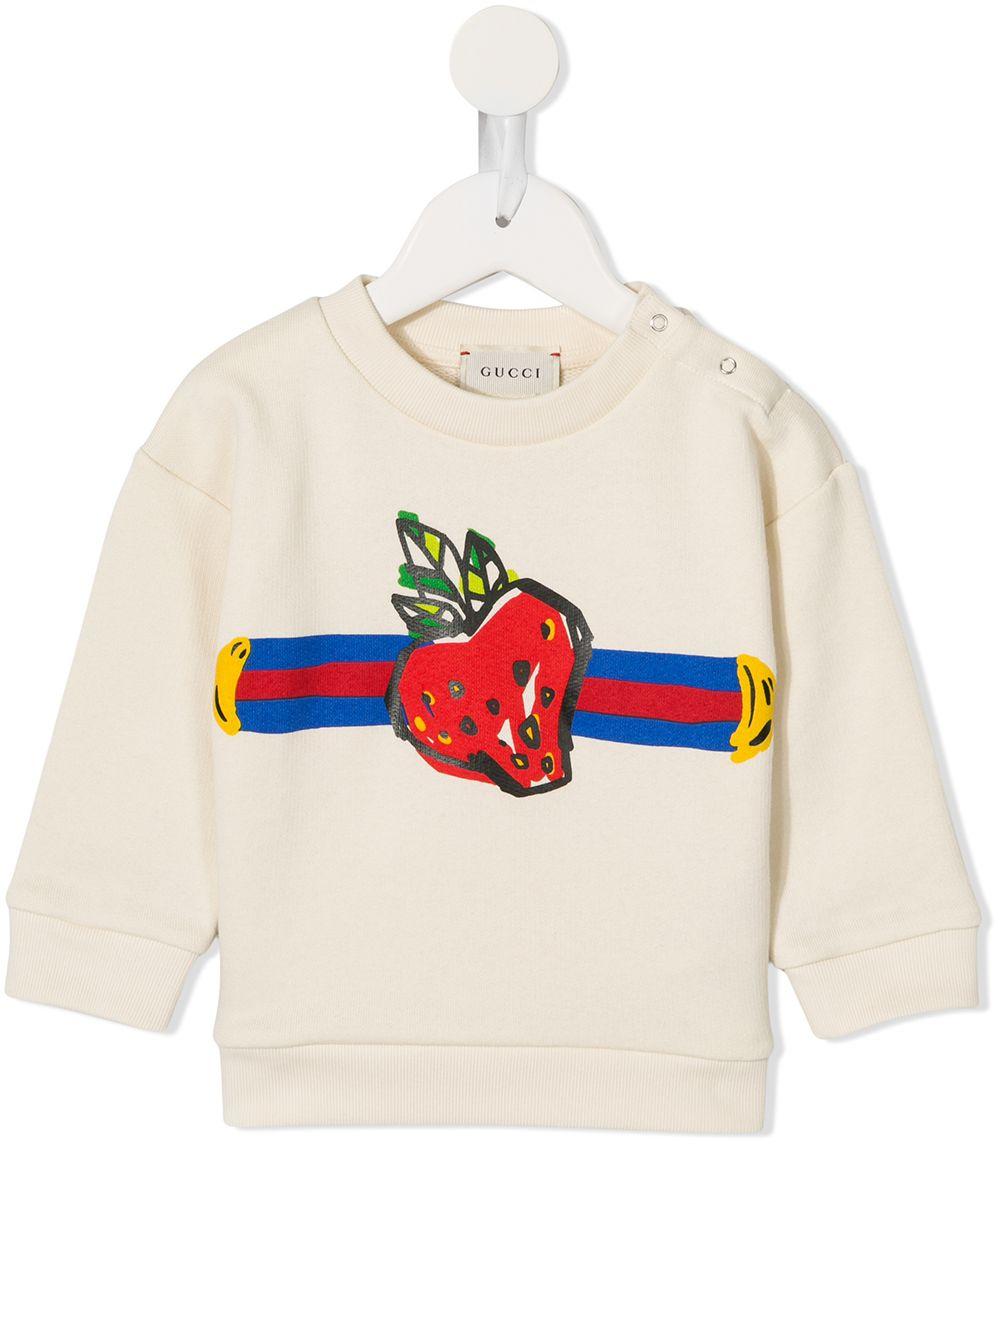 Gucci Kids | толстовка в полоску с принтом | Clouty